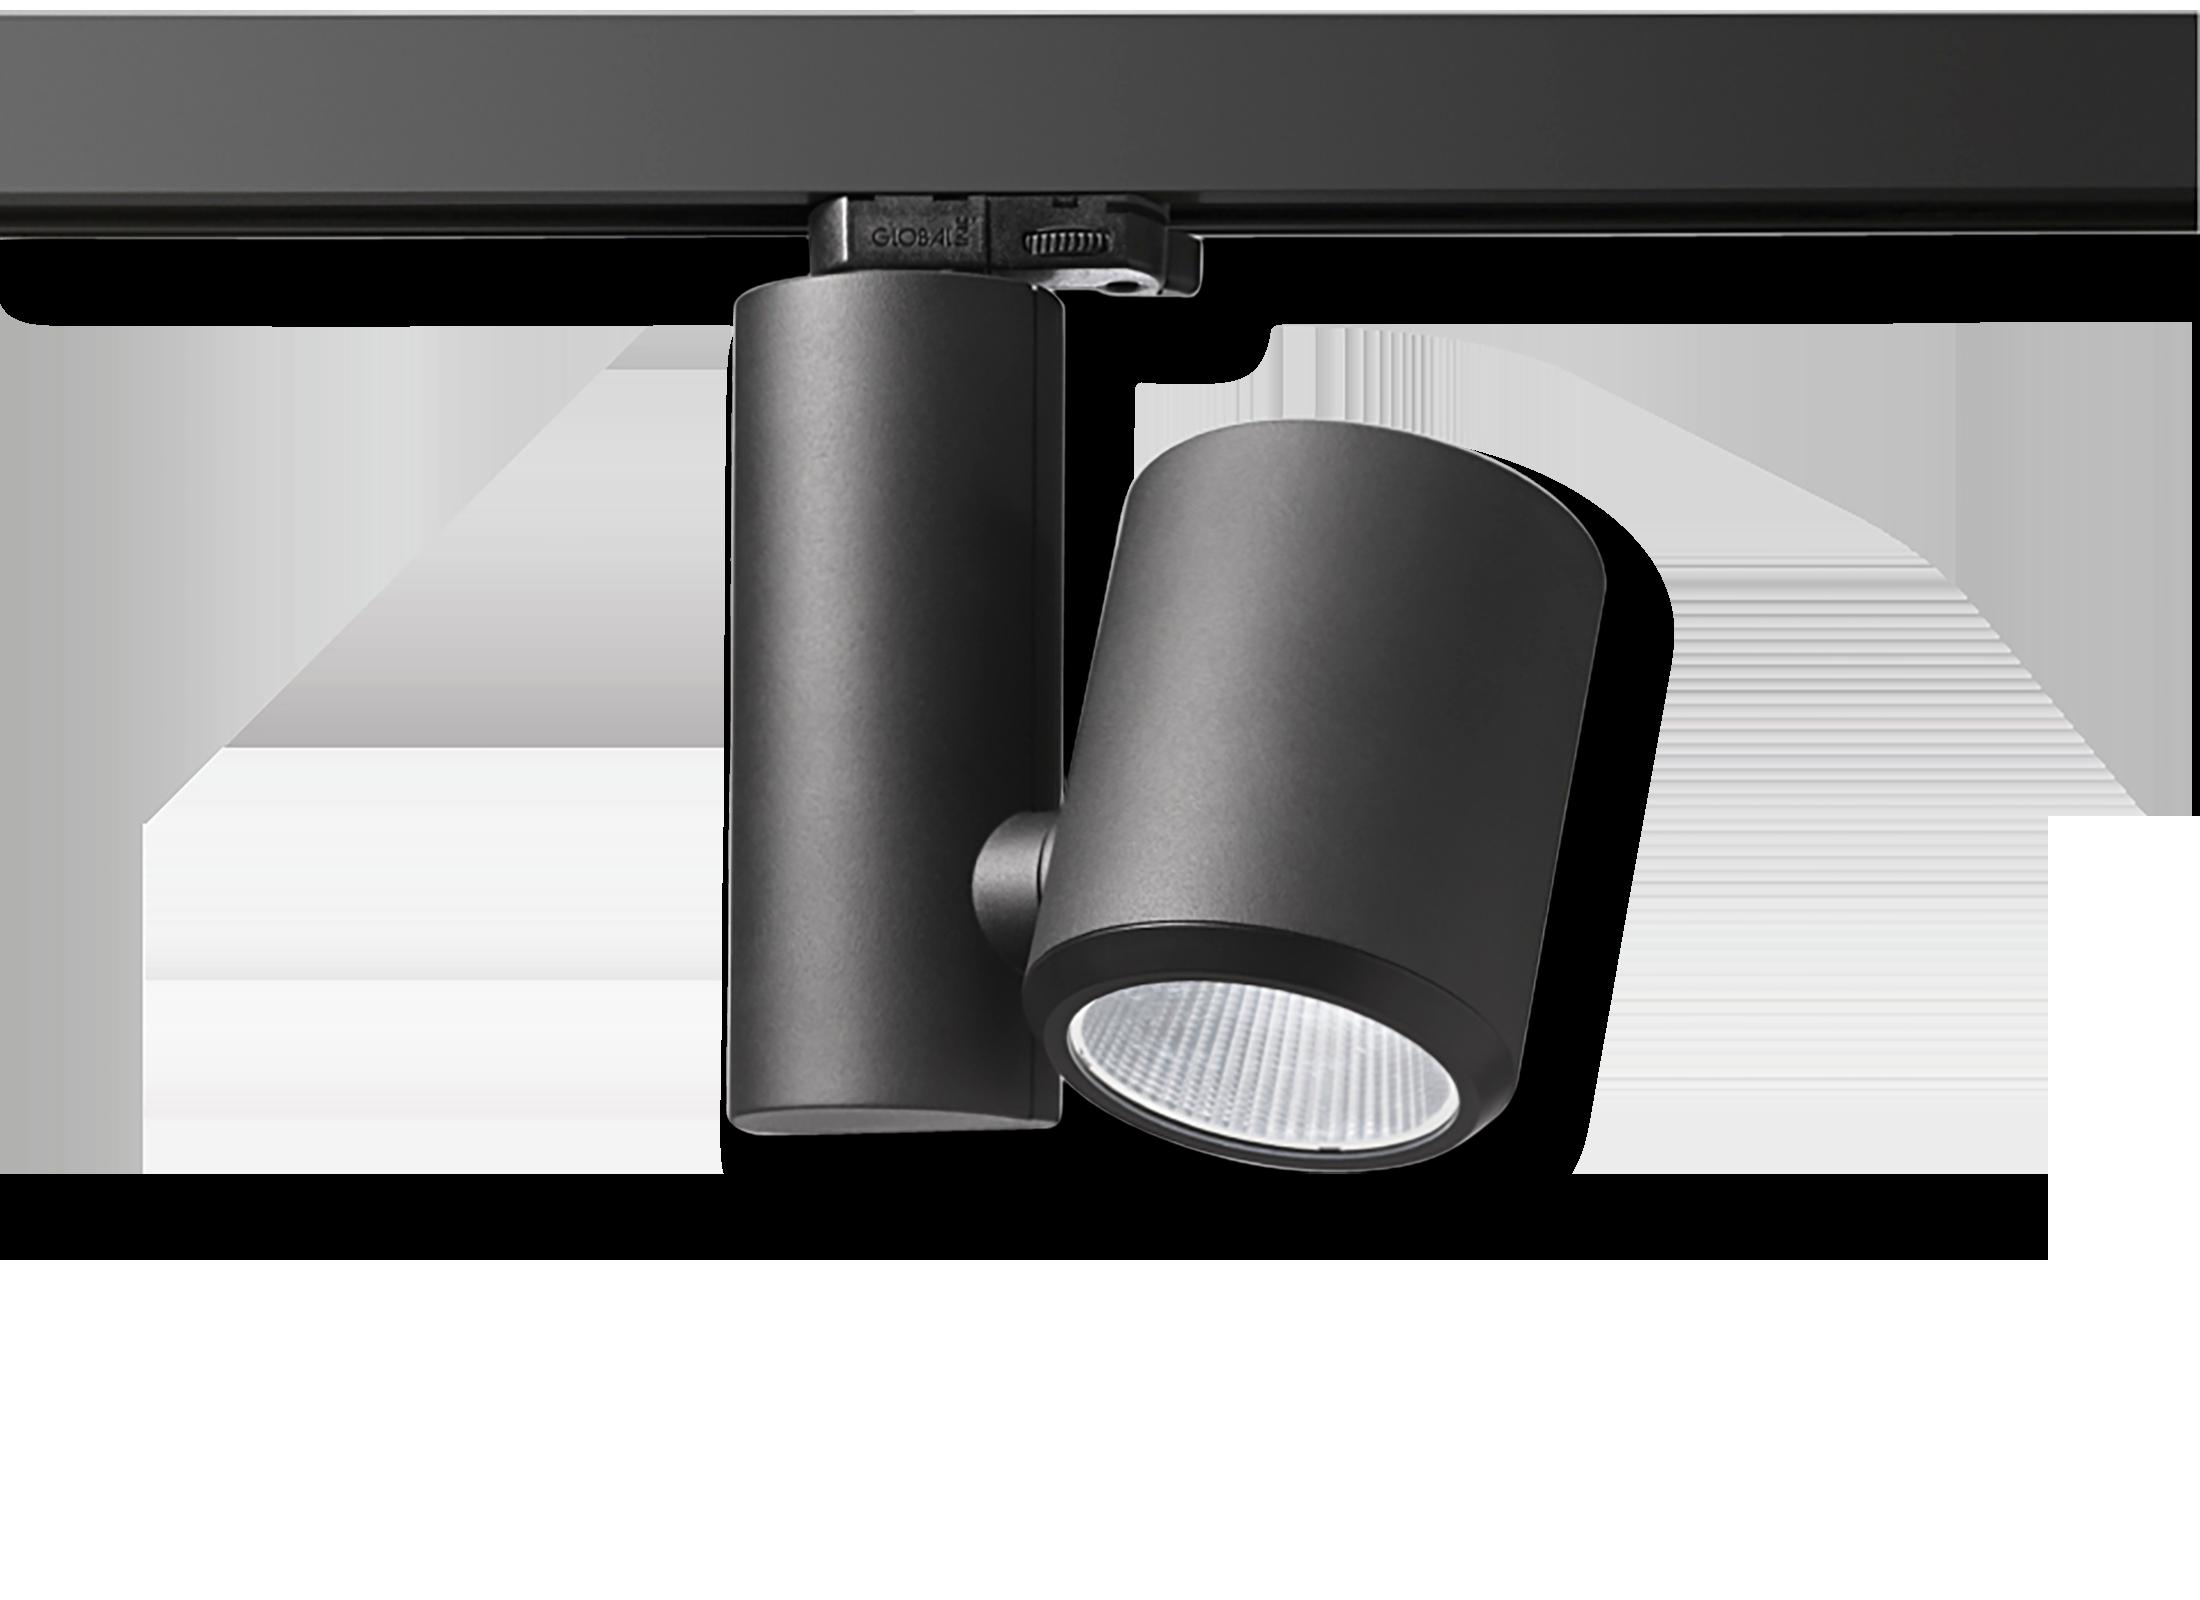 Location: Interior Light source: LED 1x35W, 2400 & 2500 Lumen ...